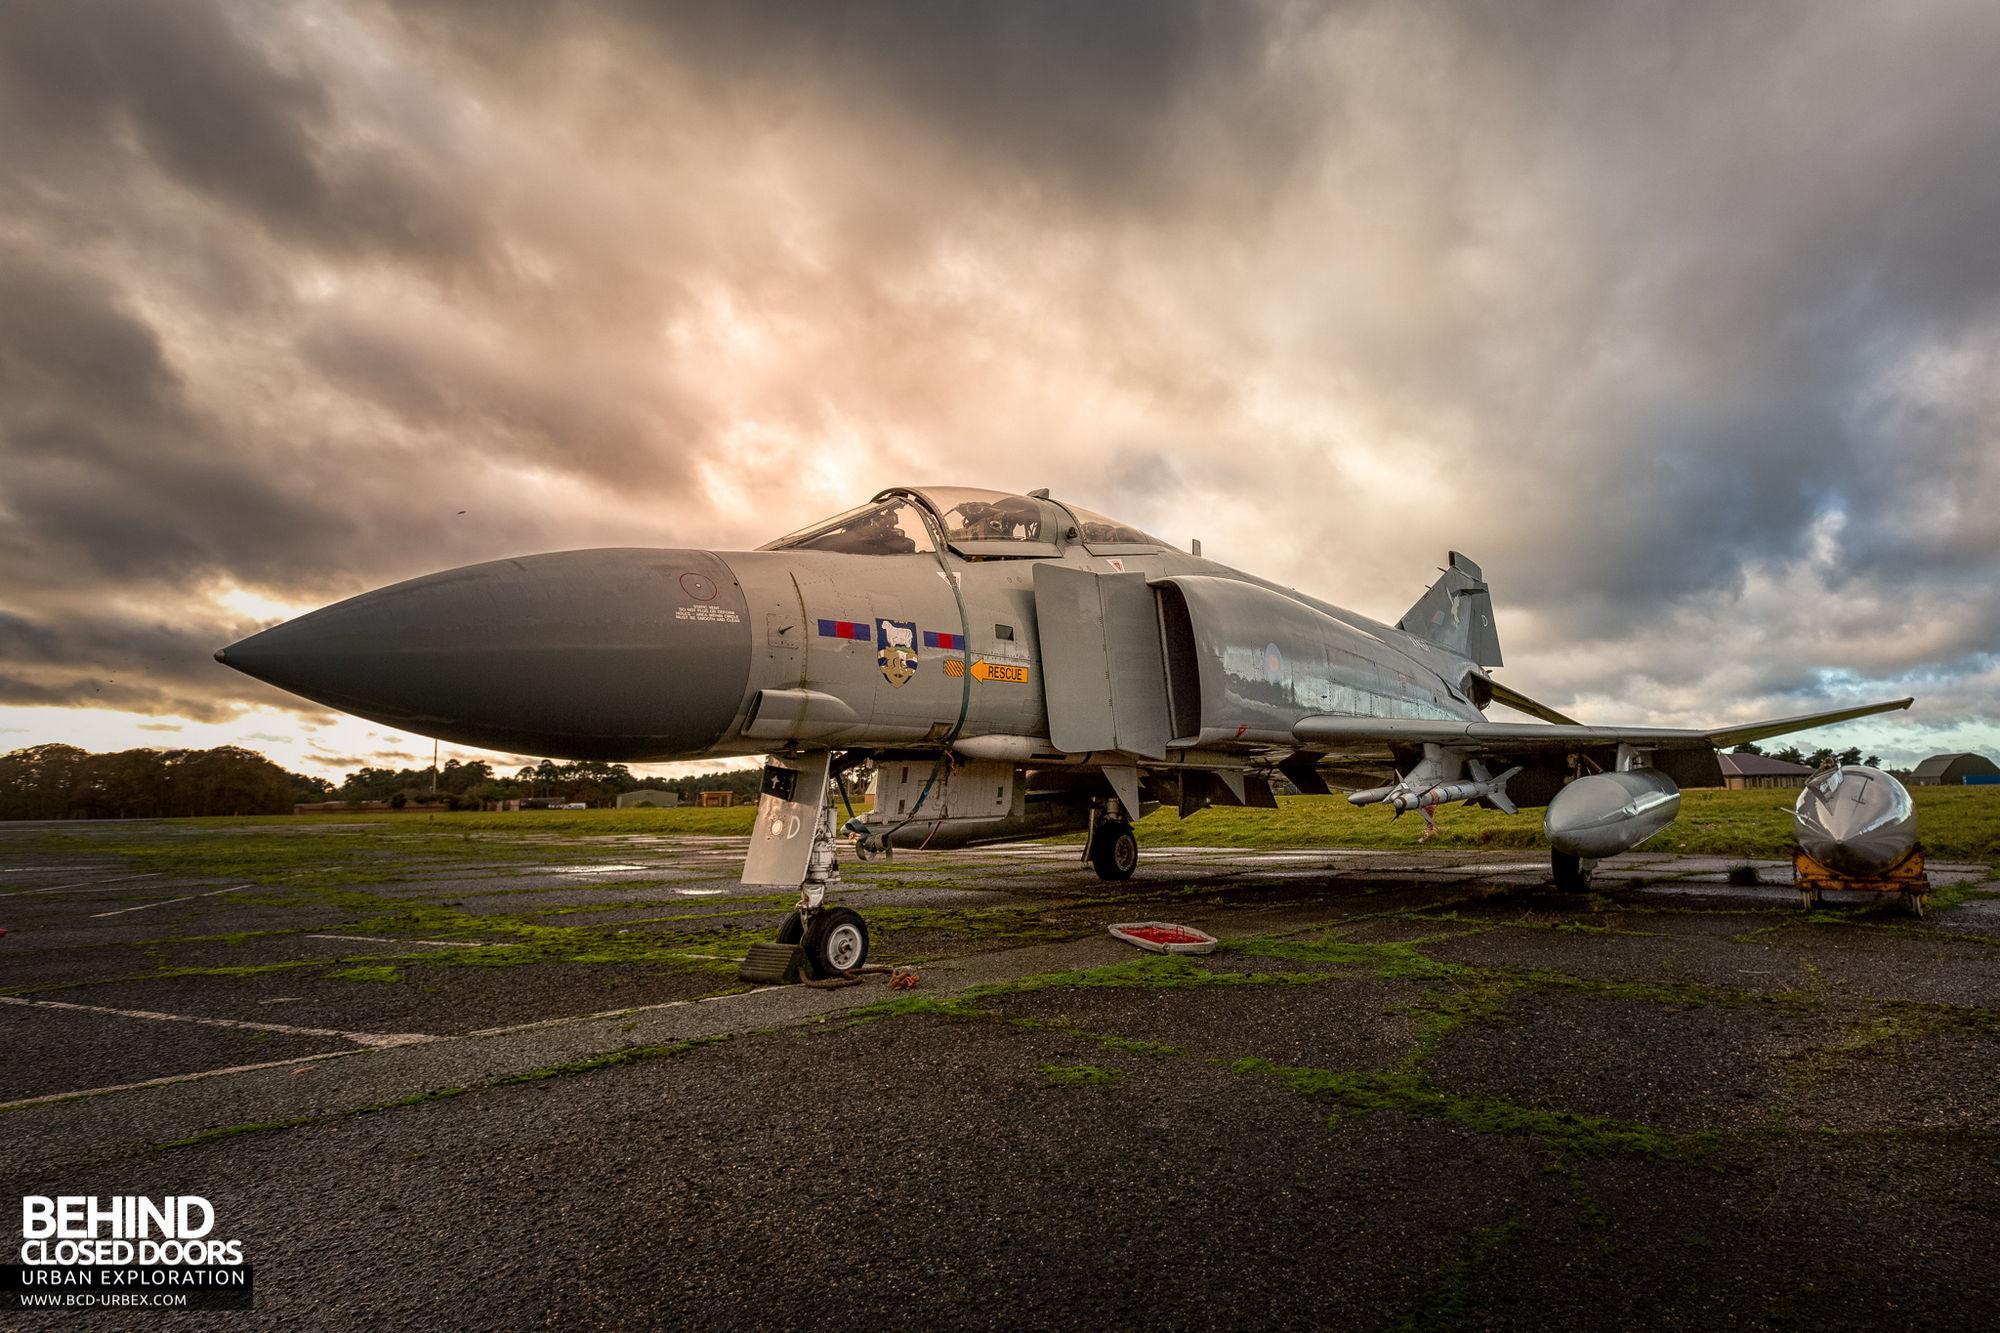 RAF Bentwaters - McDonnell Douglas F-4 Phantom Aircraft